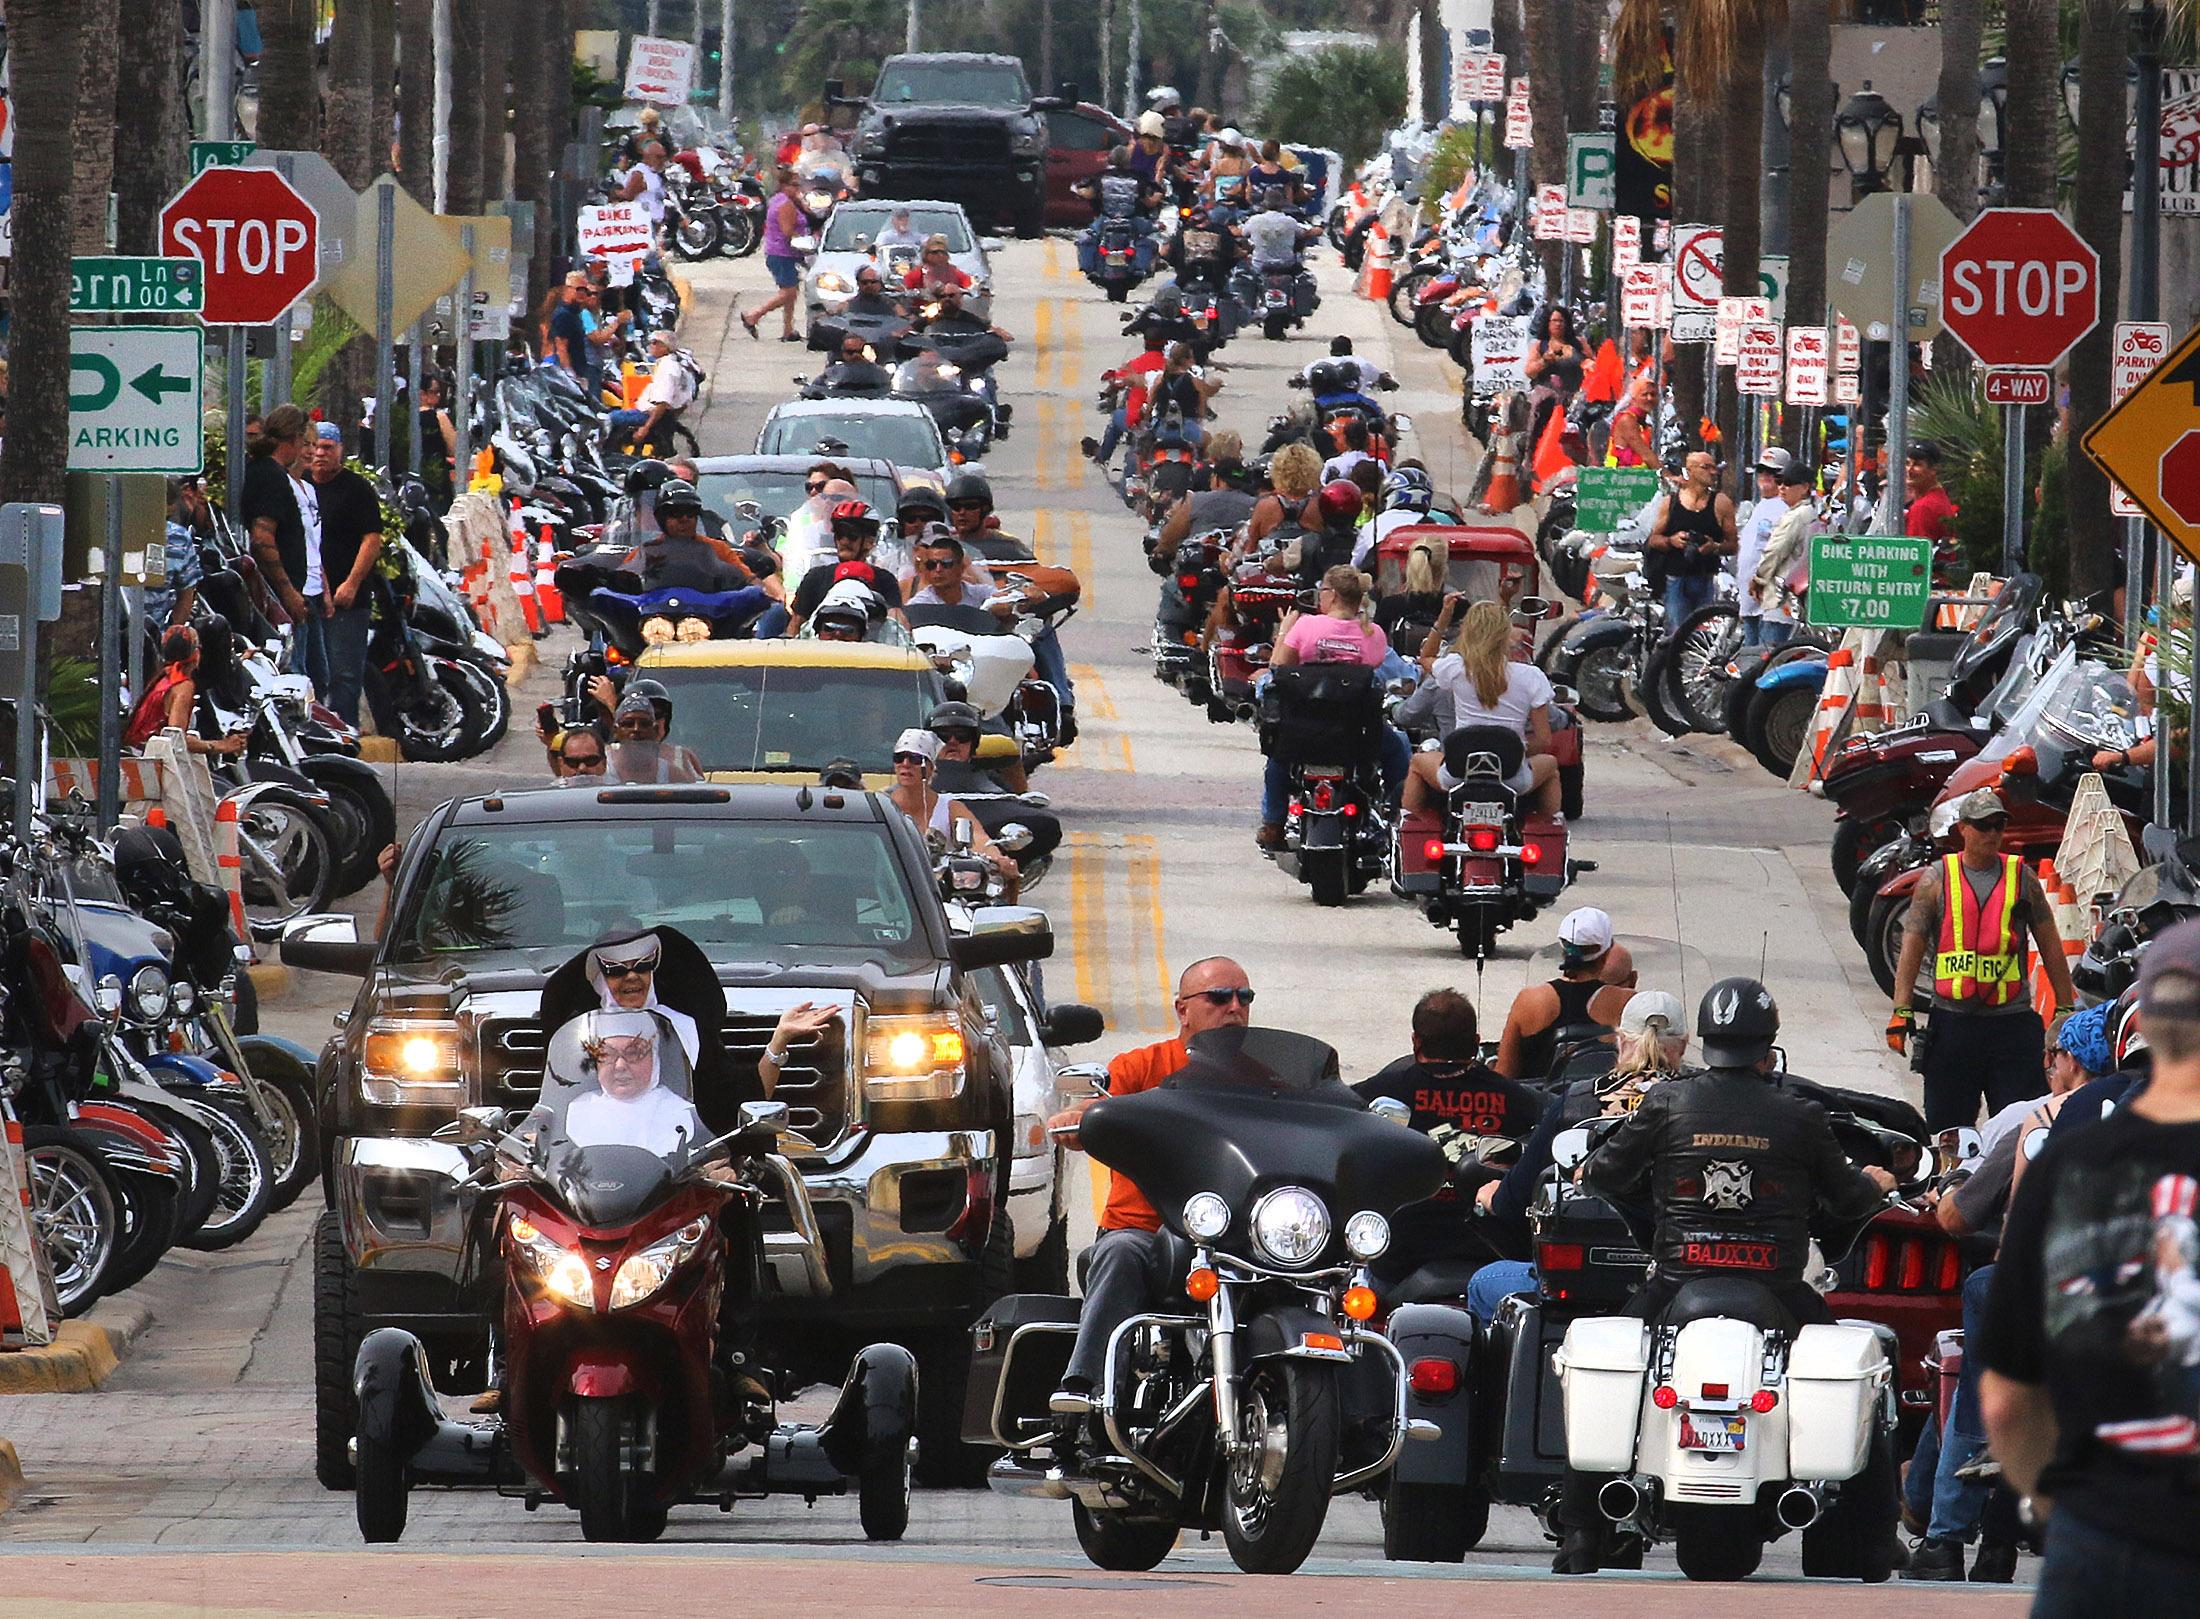 Looking west down Main Street as Biketoberfest rolls into day 2 in Daytona Beach Friday  October 16, 2015. News-Journal/JIM TILLER